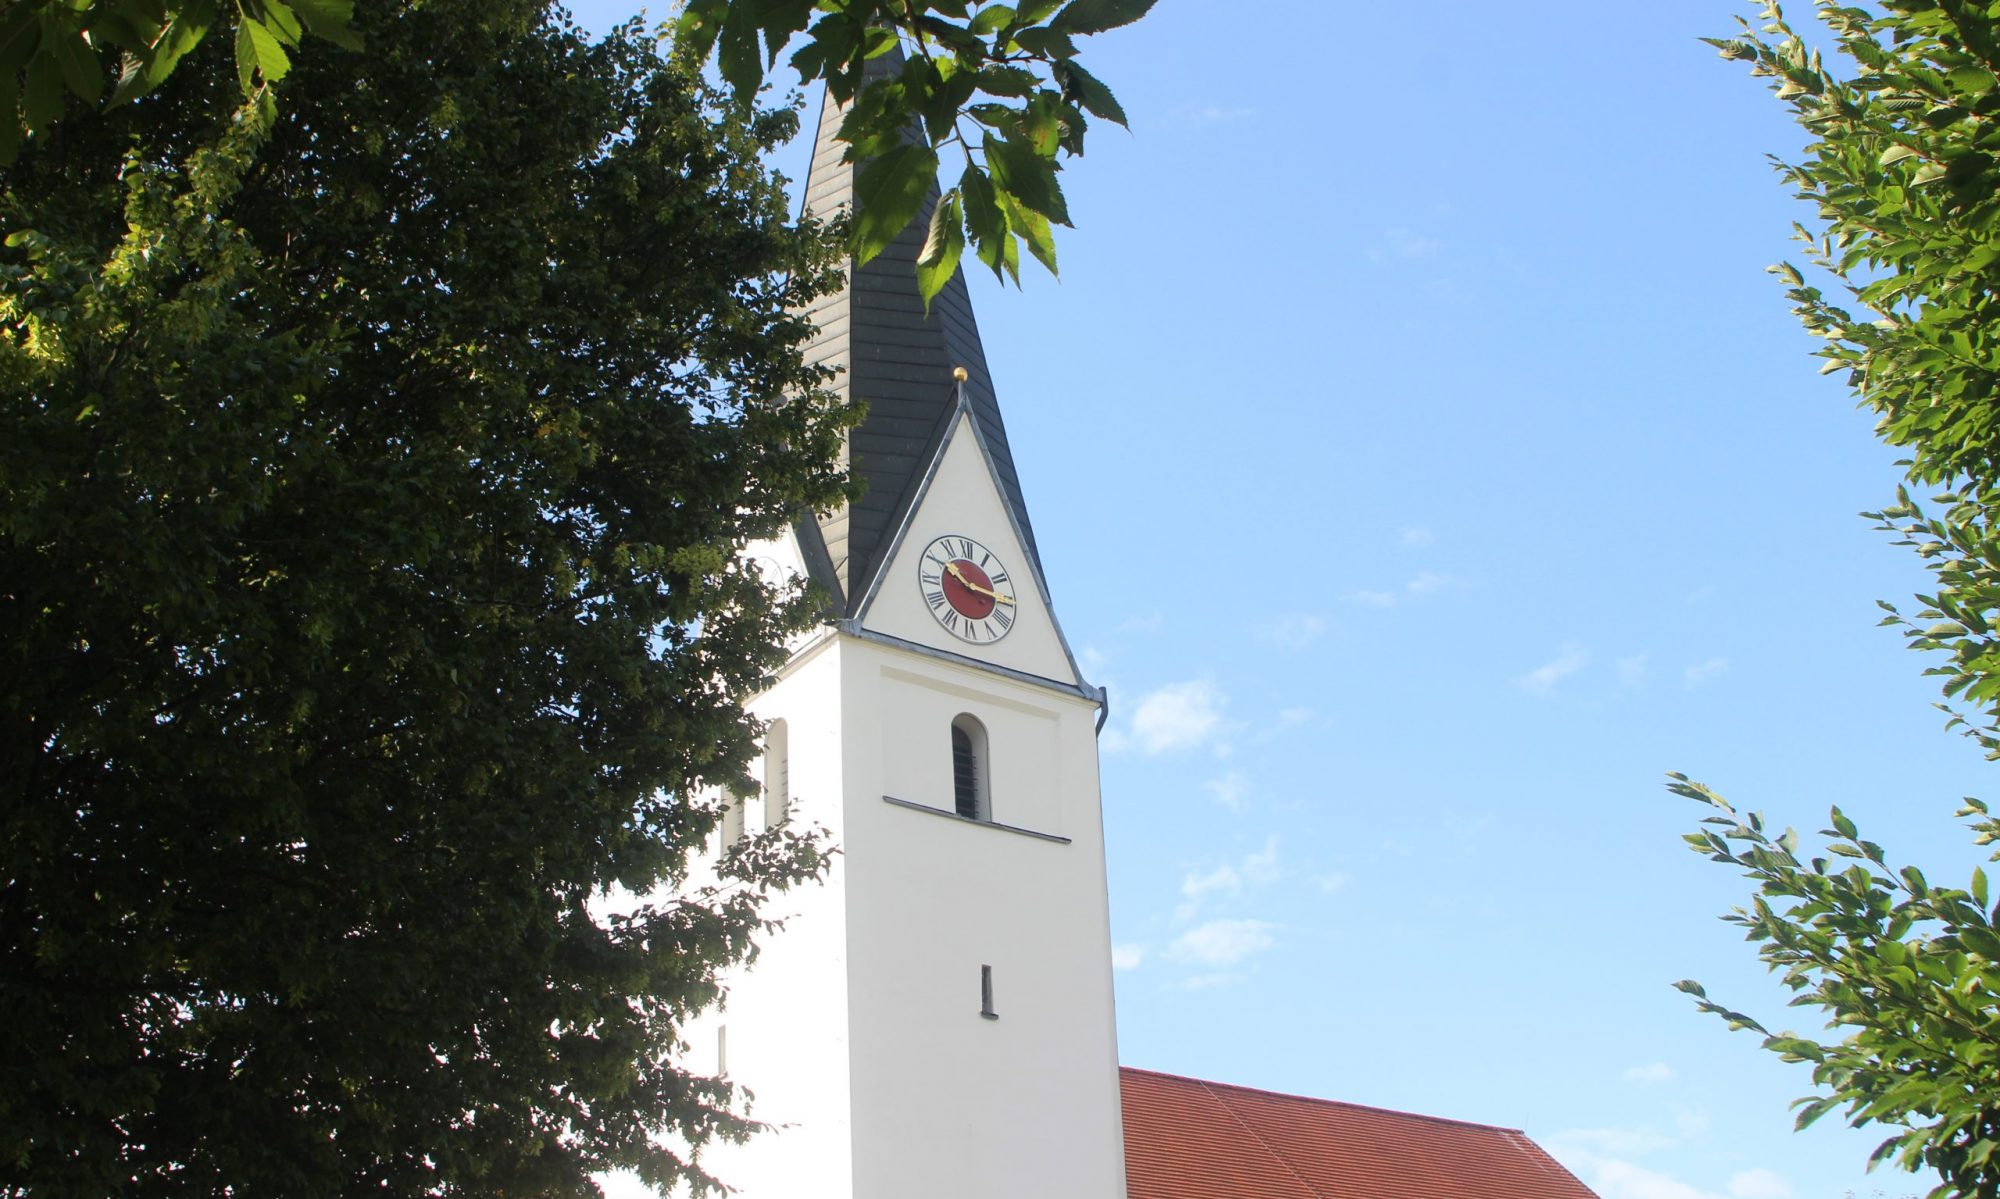 Pfarrei St. Michael Brunnen